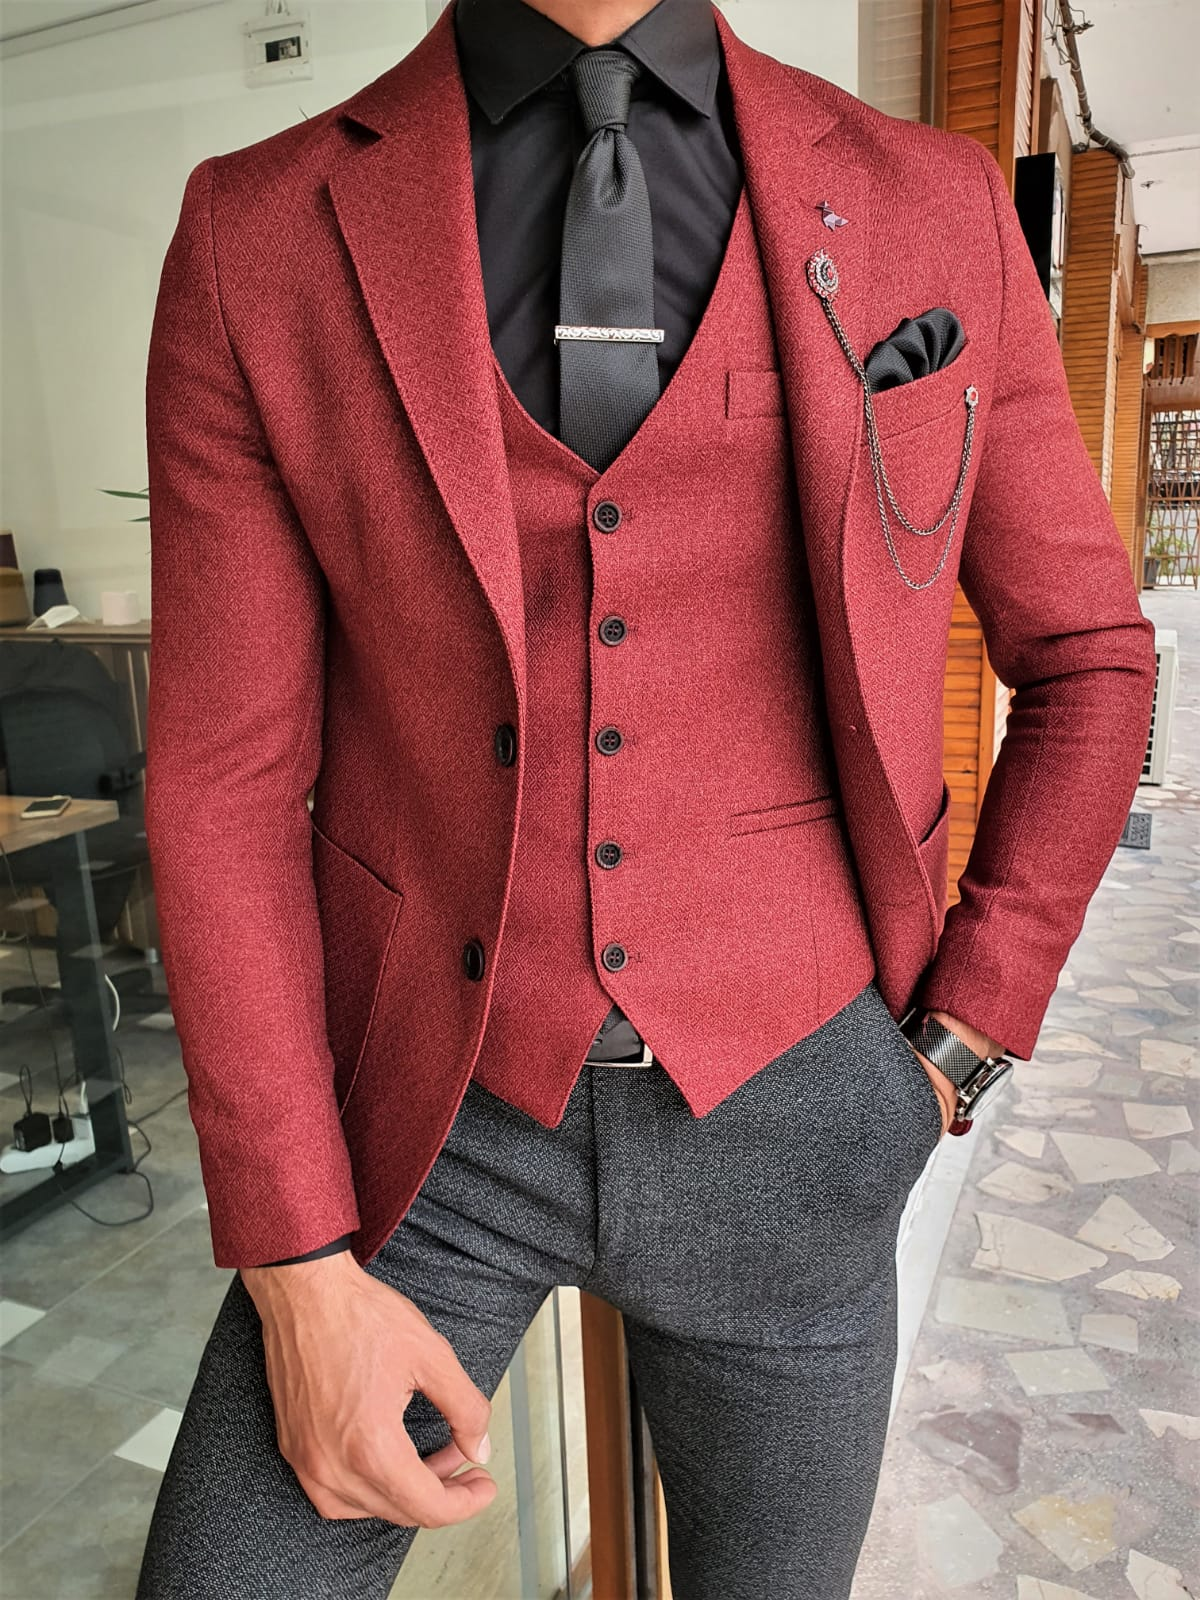 Aysoti Mitik Claret Red Slim Fit Suit